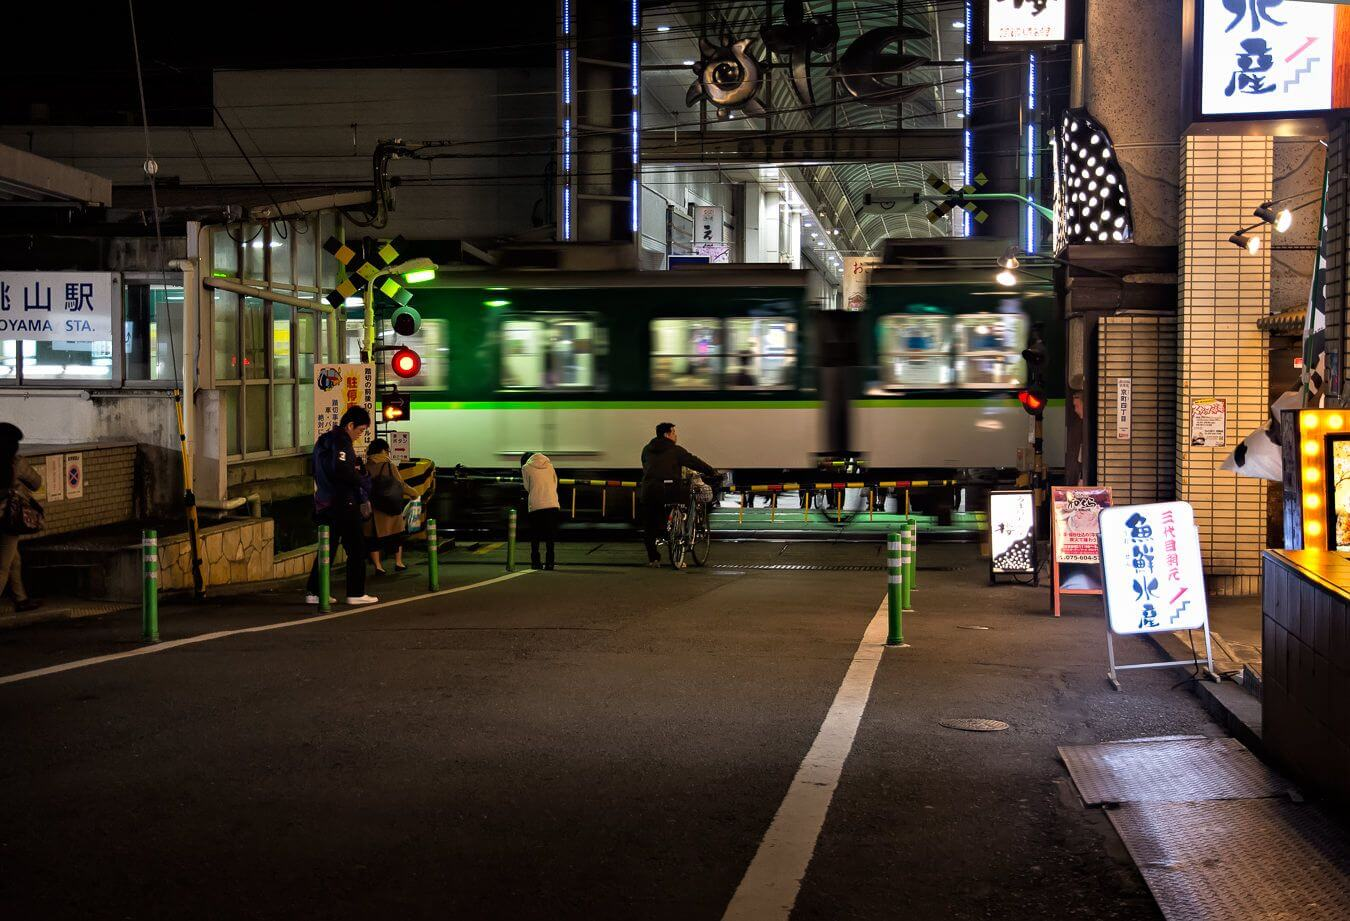 Kyoto at Night, Japan - Photo by Zed Sindelar of CuriousZed Photography